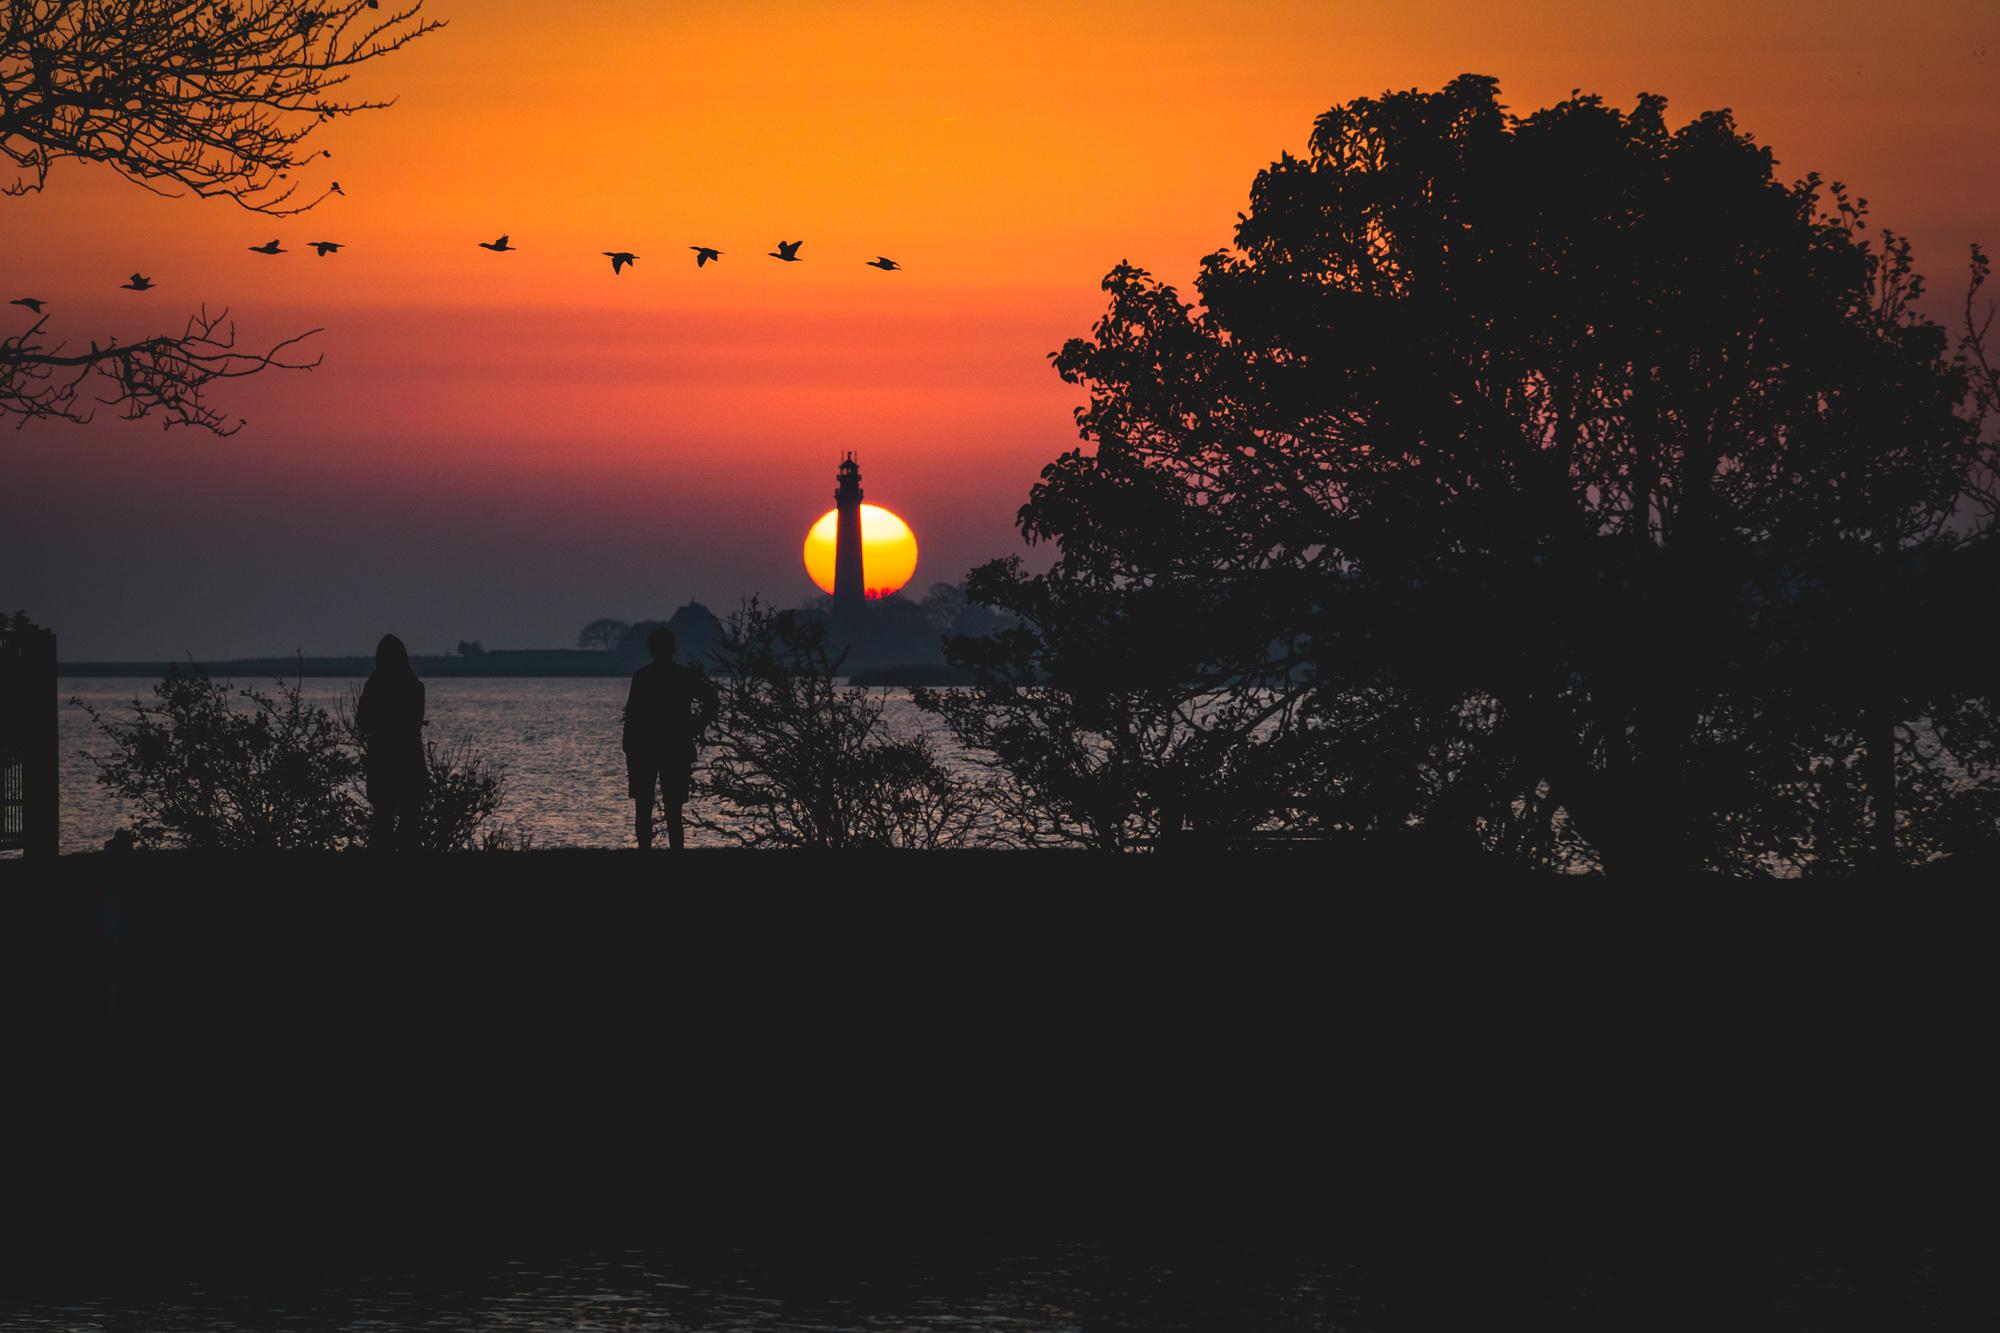 Sonnenuntergang Orth Leuchtturm Flügge